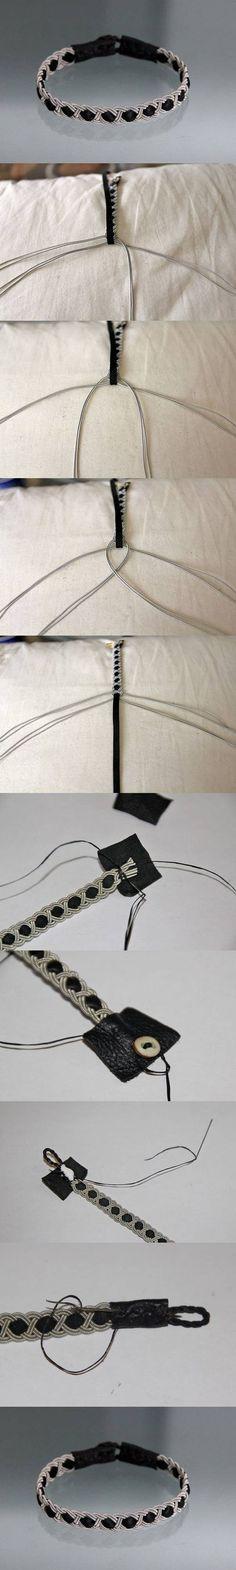 DIY Jewelry: DIY Cute Wristband cute crafts diy easy crafts diy ideas diy crafts do it yourse Macrame Jewelry, Wire Jewelry, Jewelry Crafts, Jewelery, Handmade Jewelry, Wire Rings, Earrings Handmade, Jewelry Ideas, Diy Schmuck